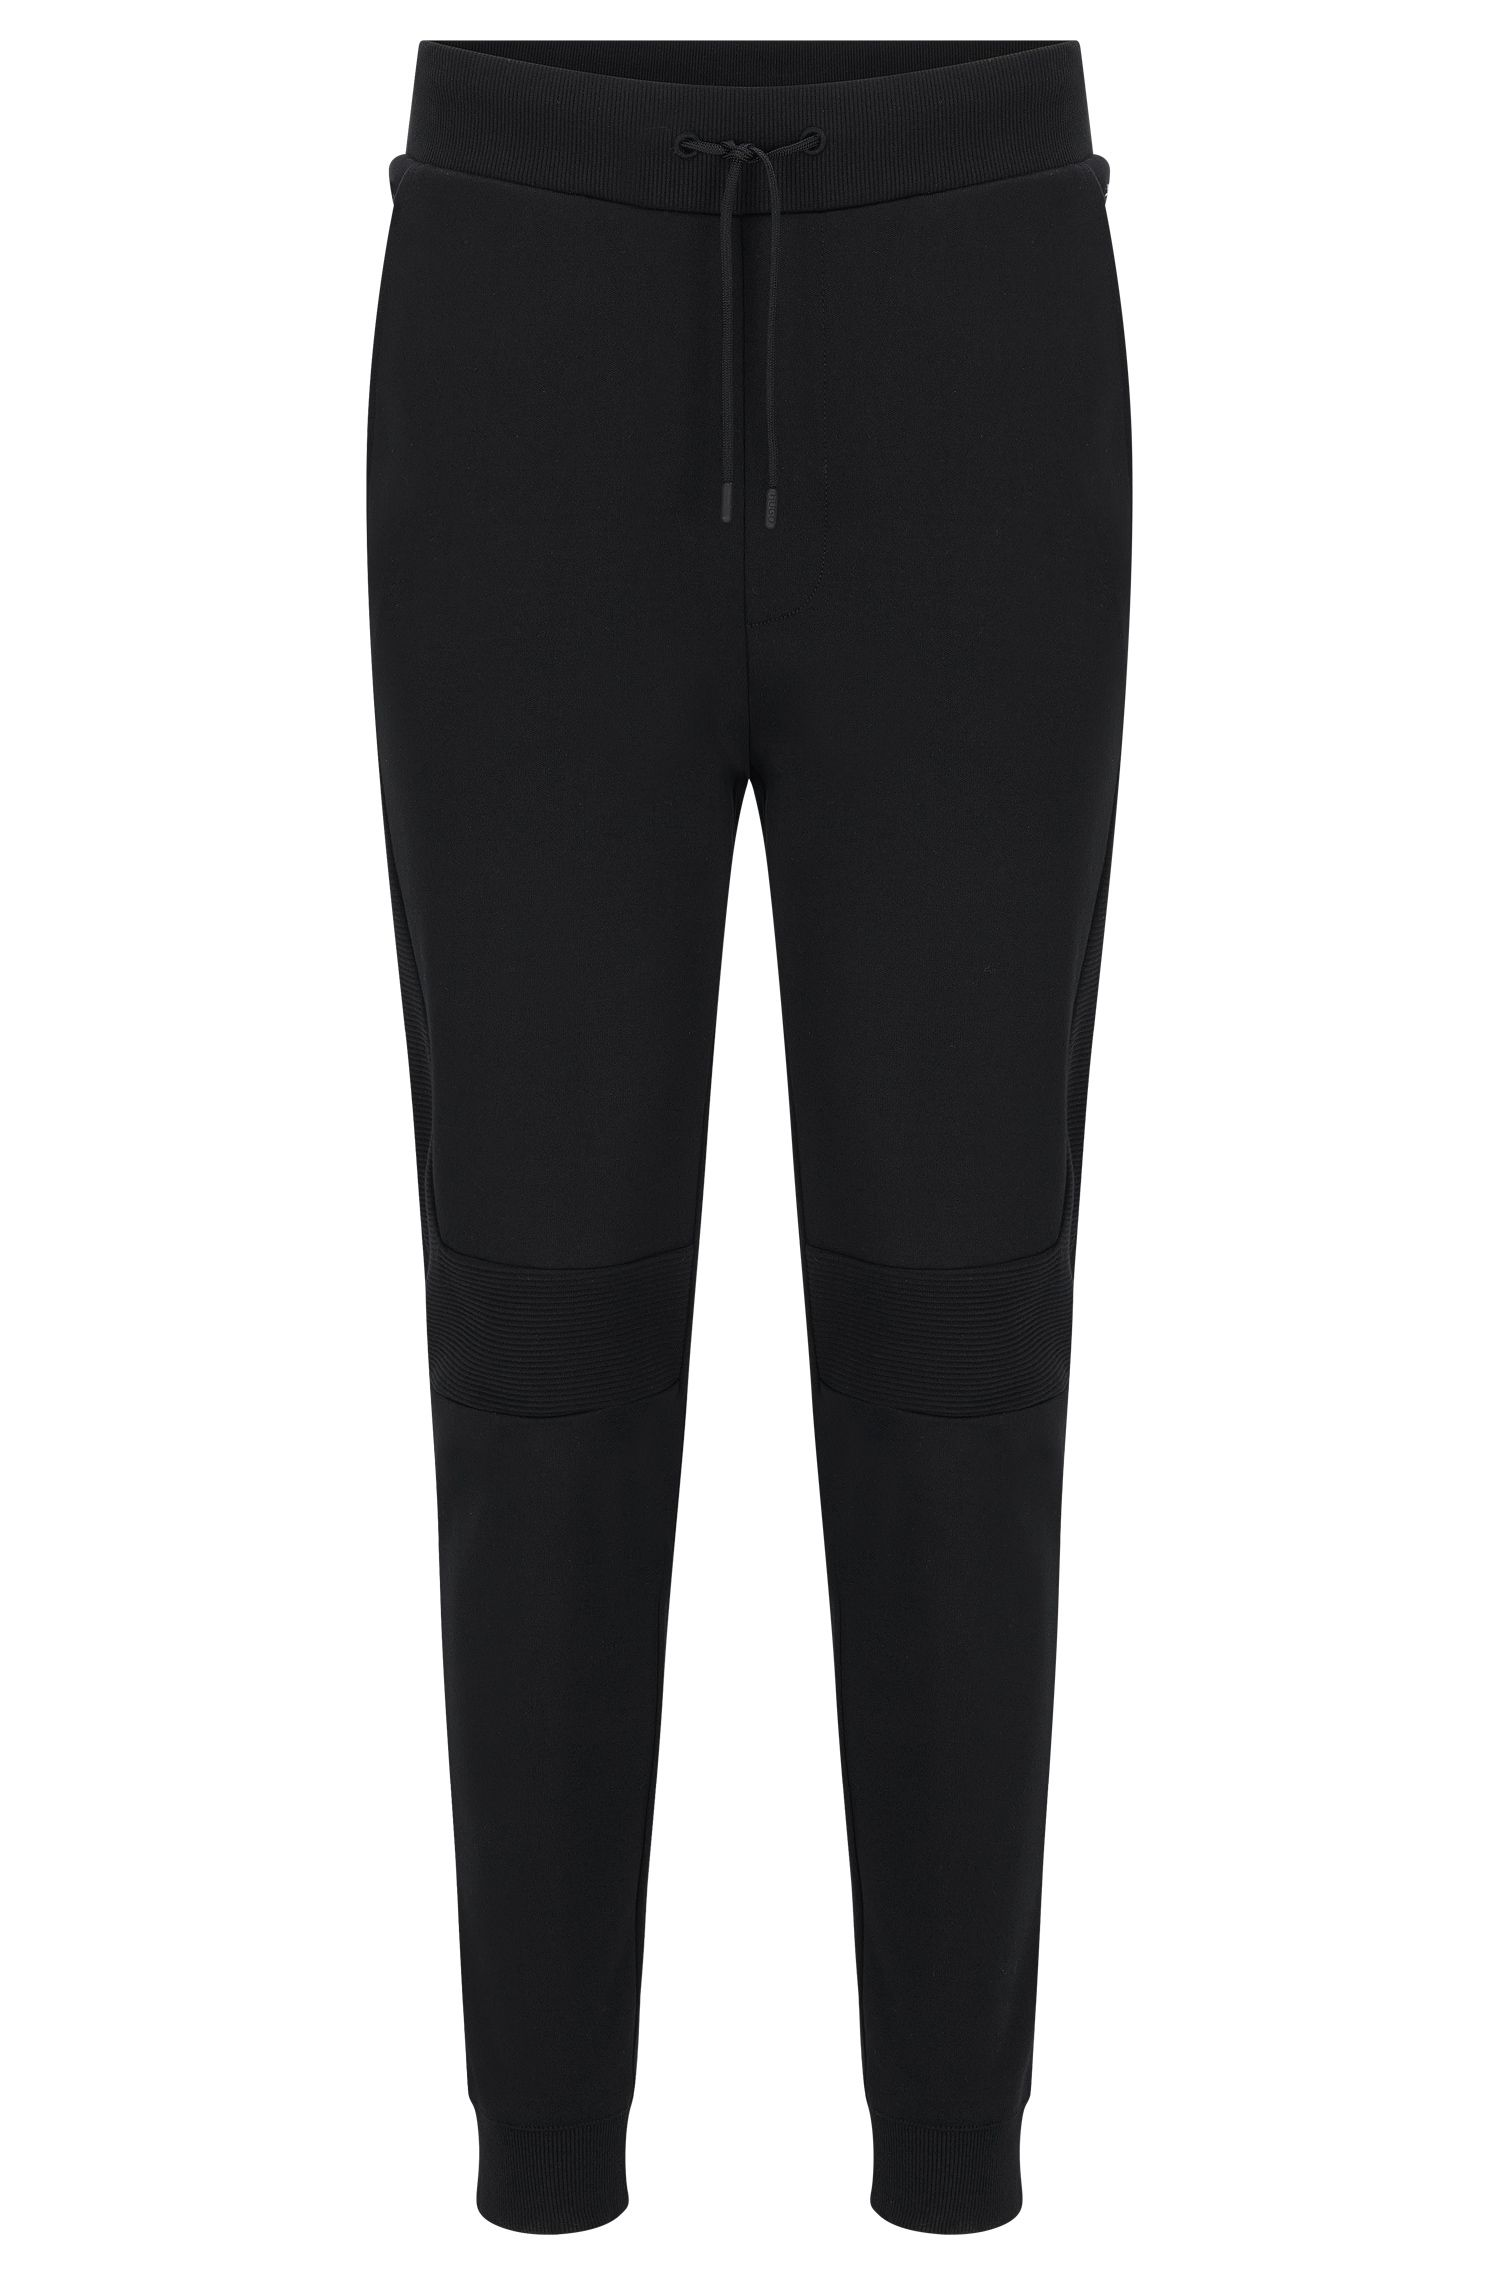 'Darlton' | Cotton Jersey Lounge Pants